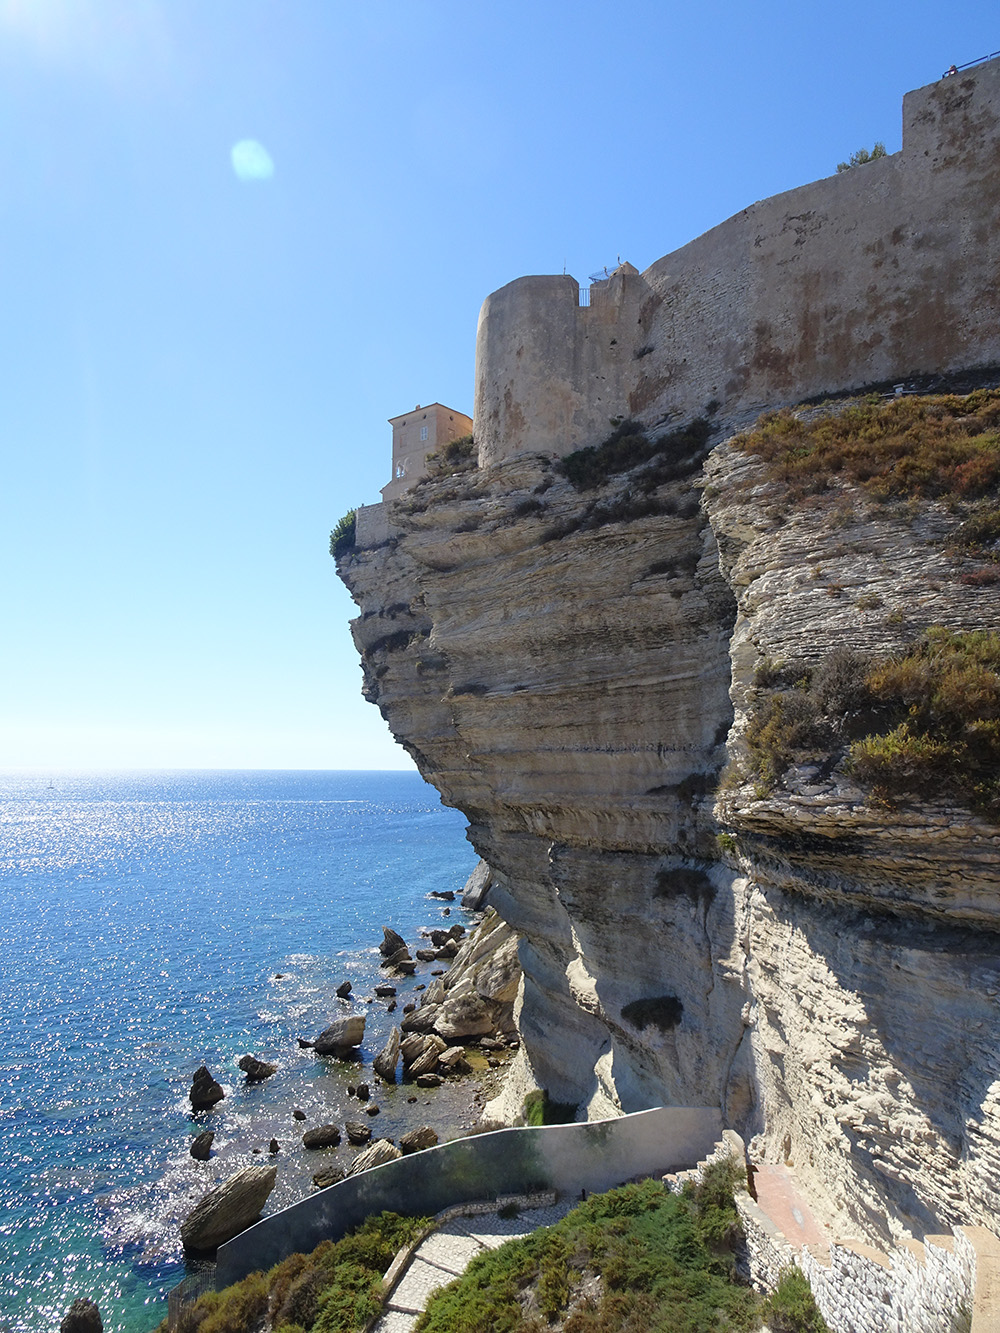 De befaamde rots van Bonifacio